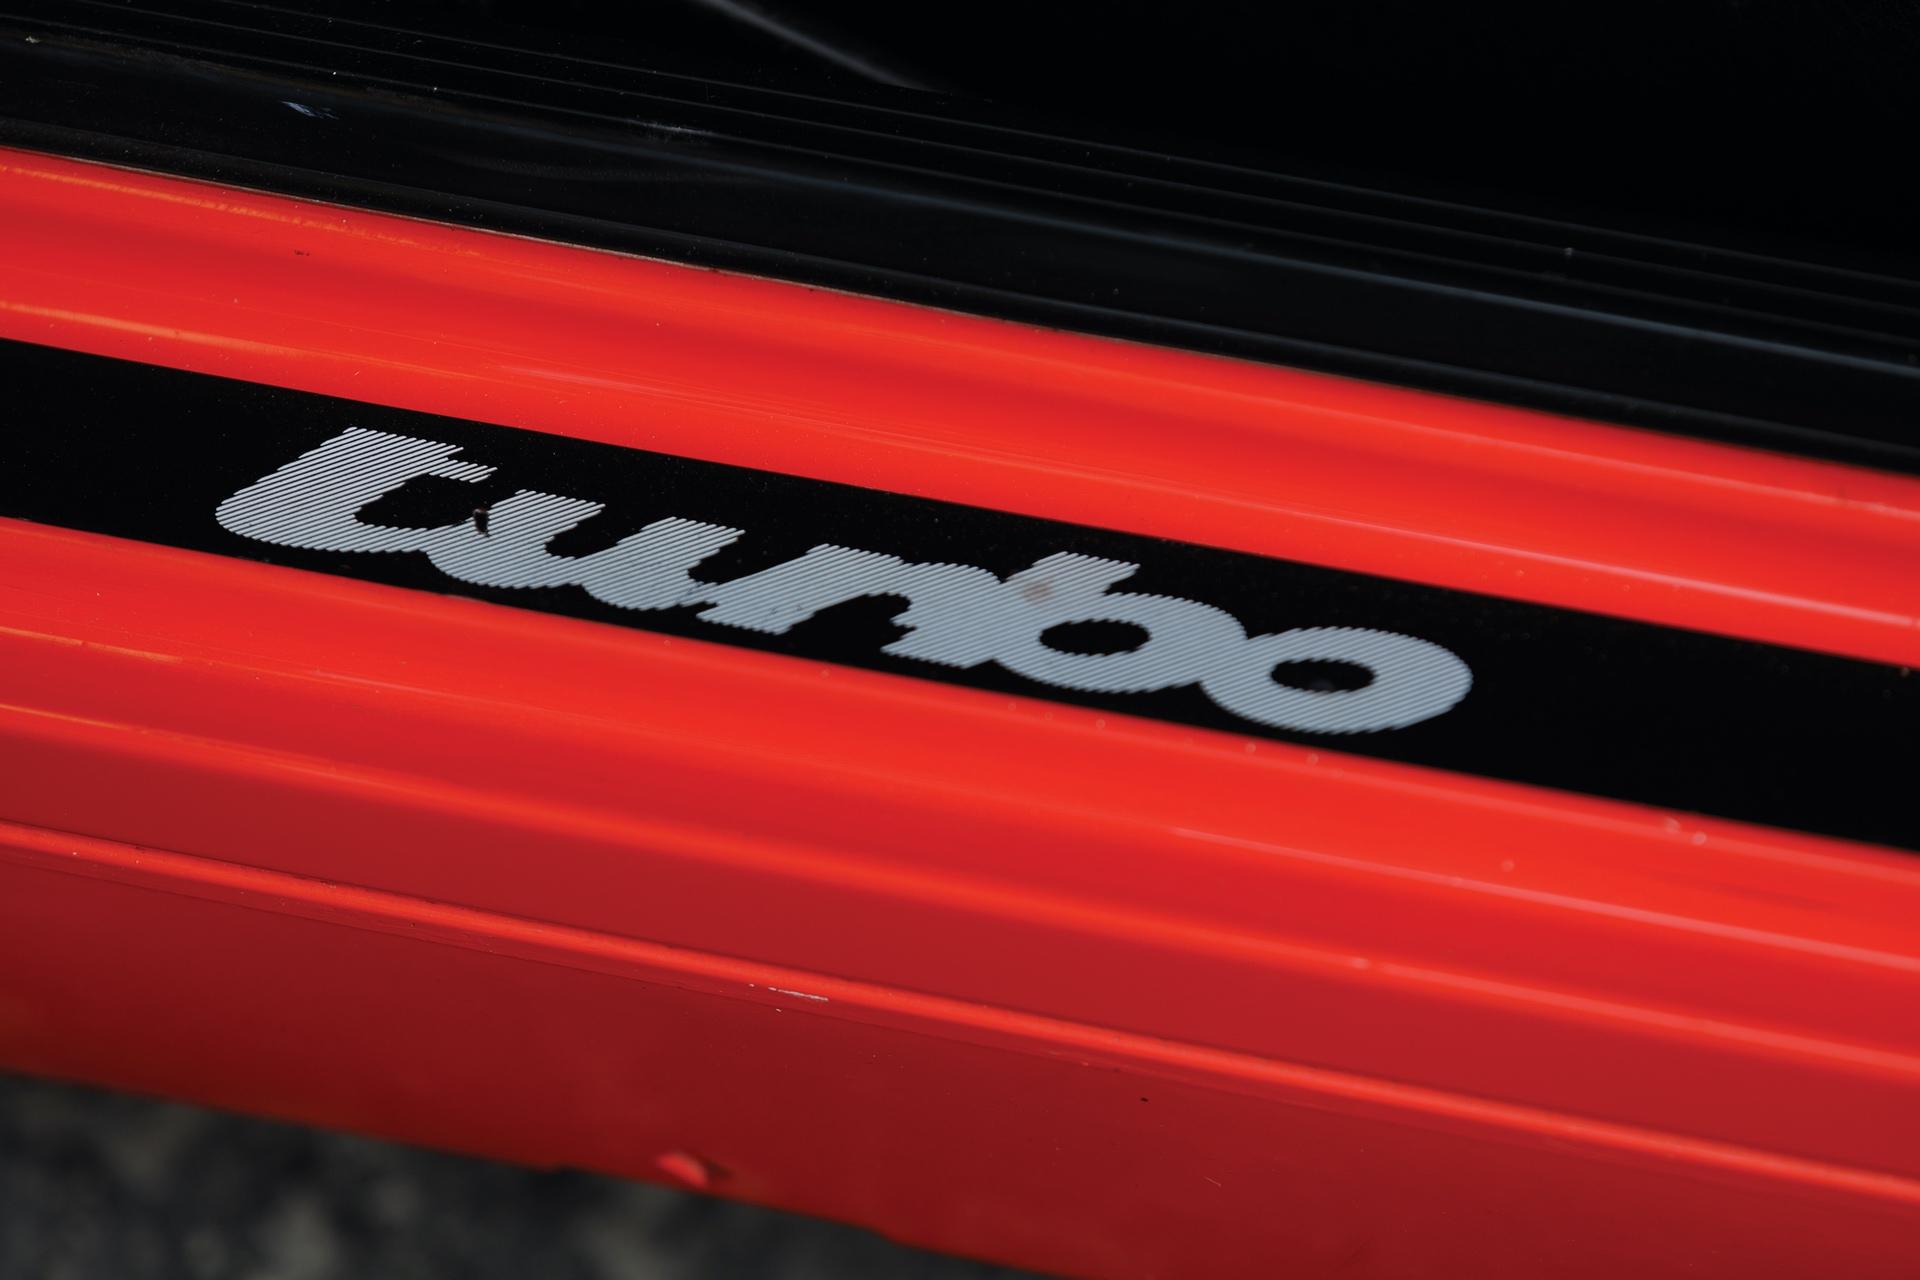 1982-Porsche-924-Carrera-GTS-_7